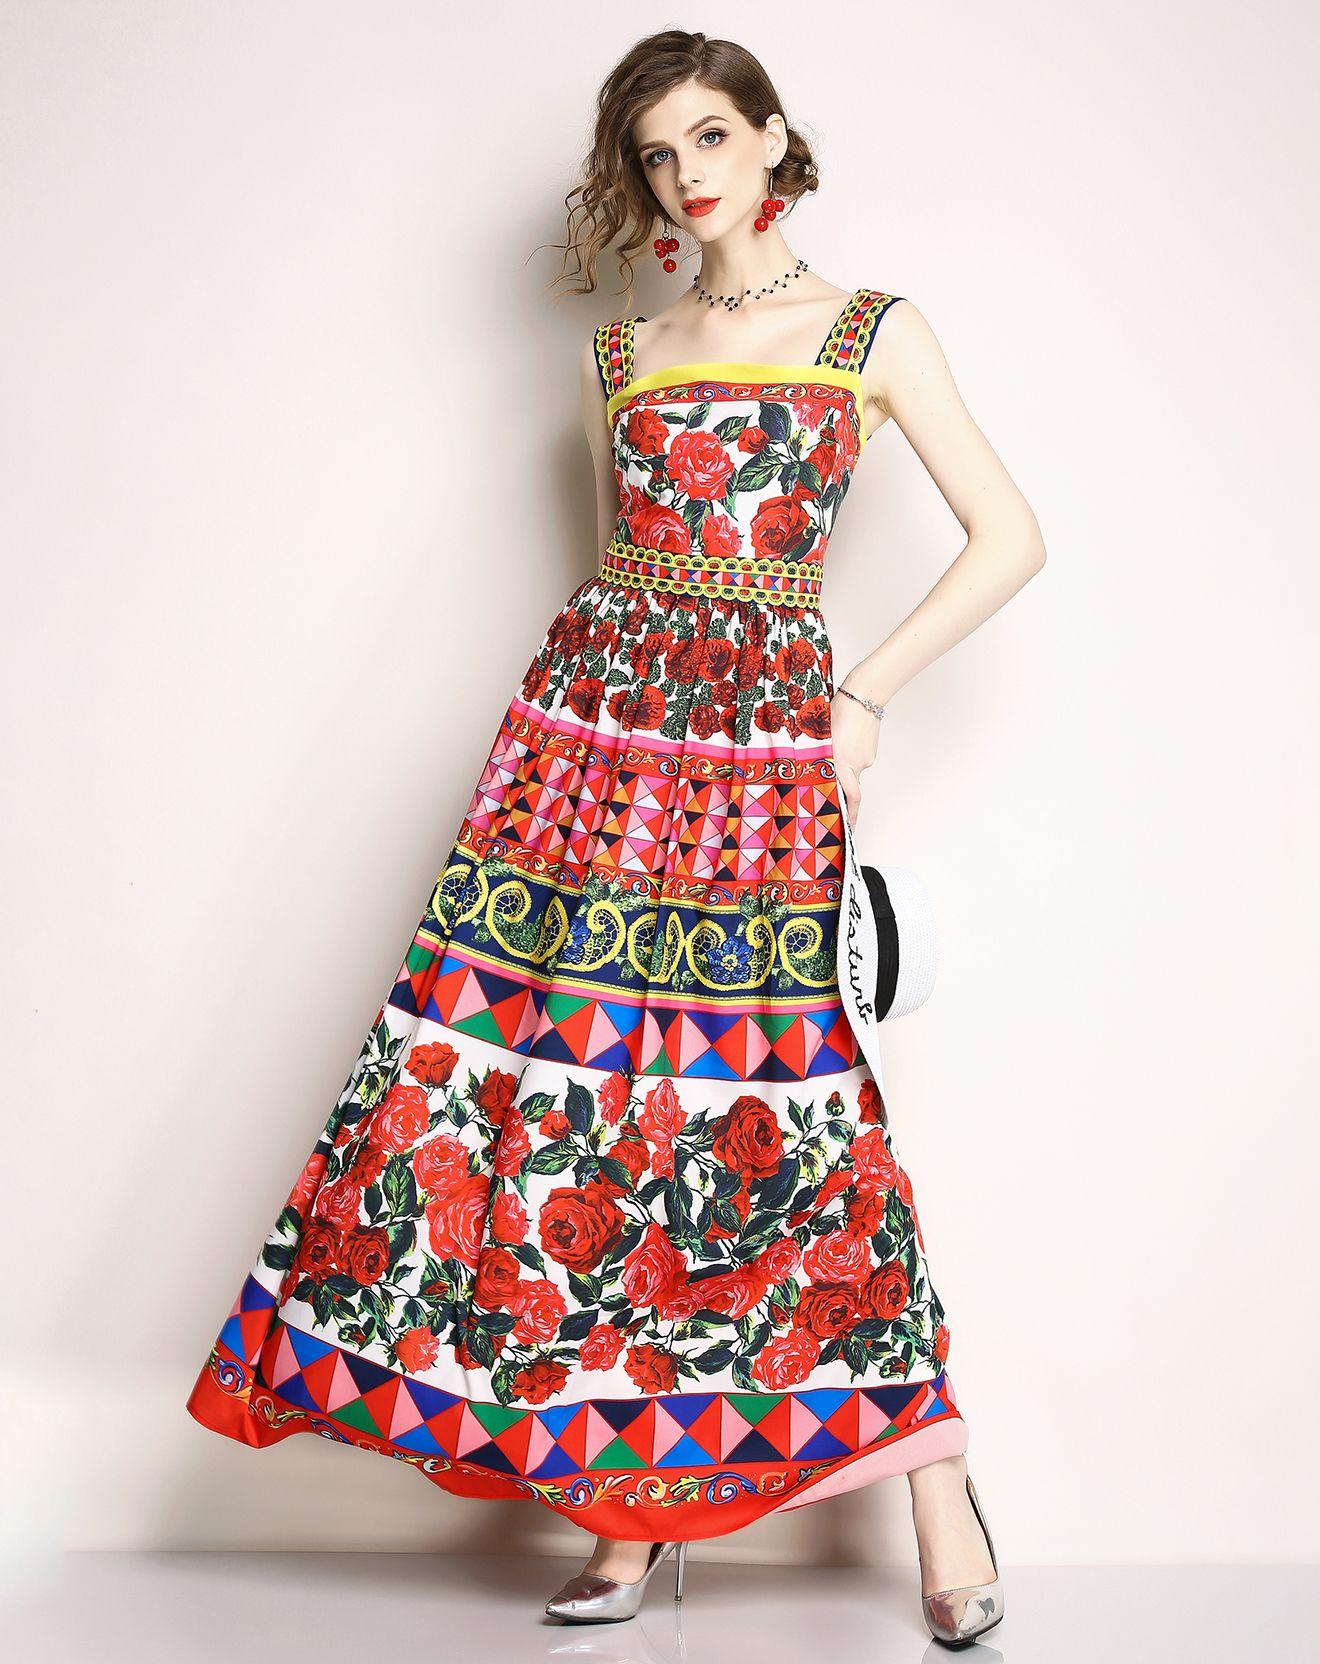 Imprimée Kaimilan Bazarchic 59eWeeding Robe Multicolore 0wNm8vn